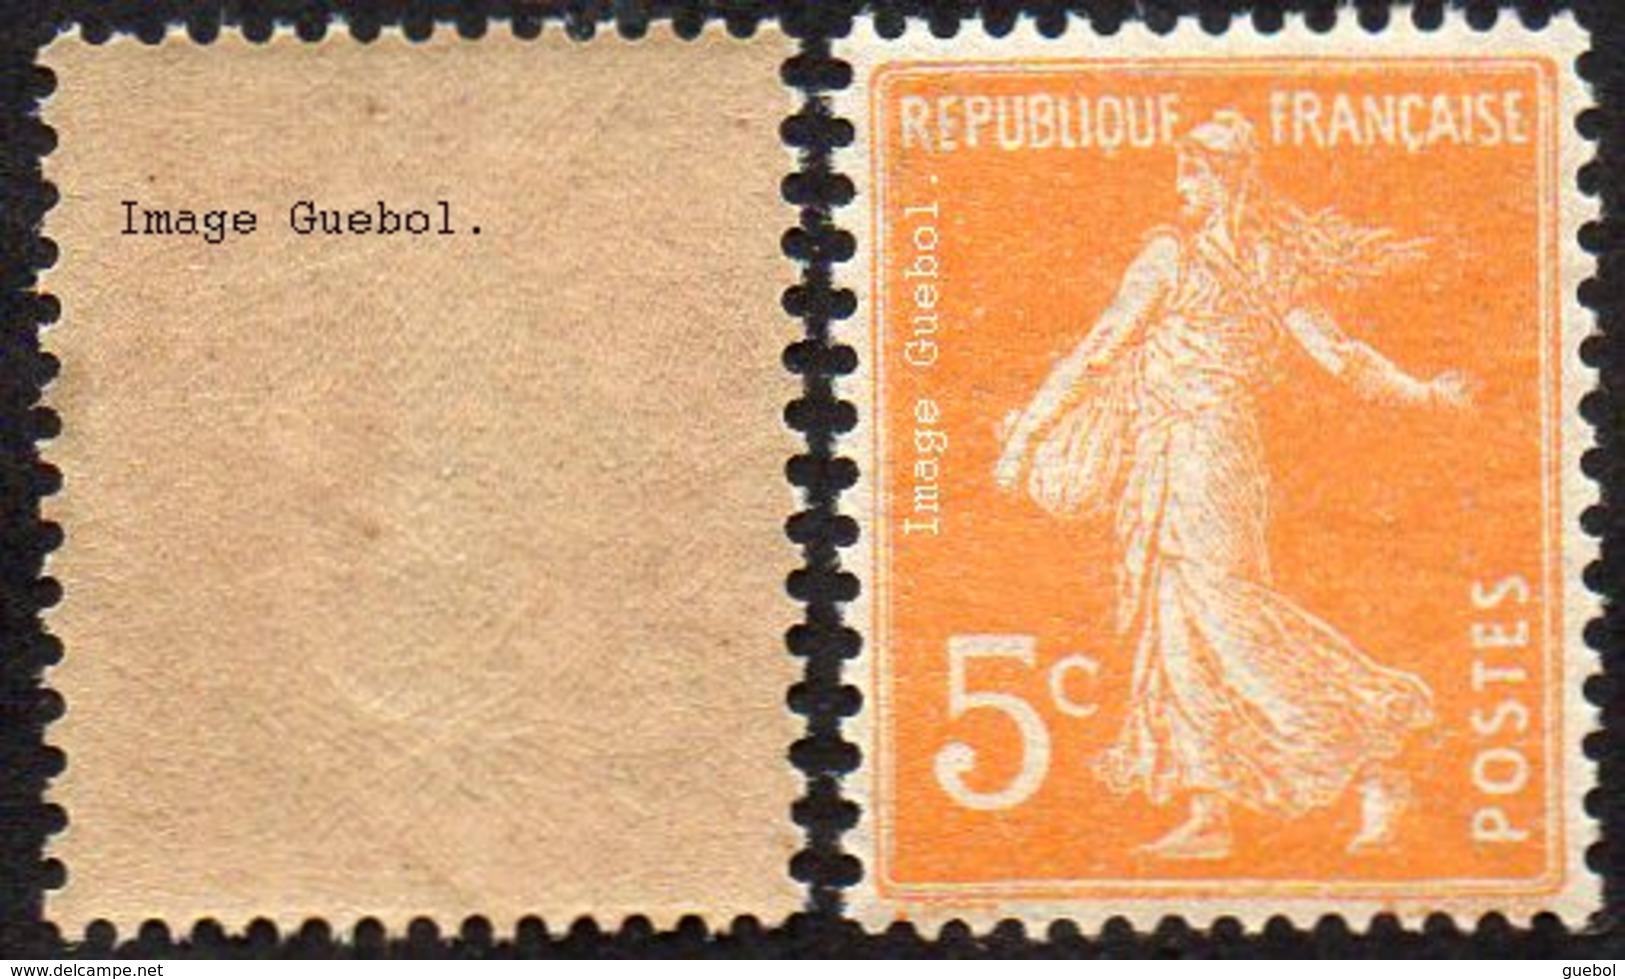 France Semeuse De Roty N°  158 ** Plein Fond Sans Sol Le 5c Orange Type_1 - 1906-38 Säerin, Untergrund Glatt